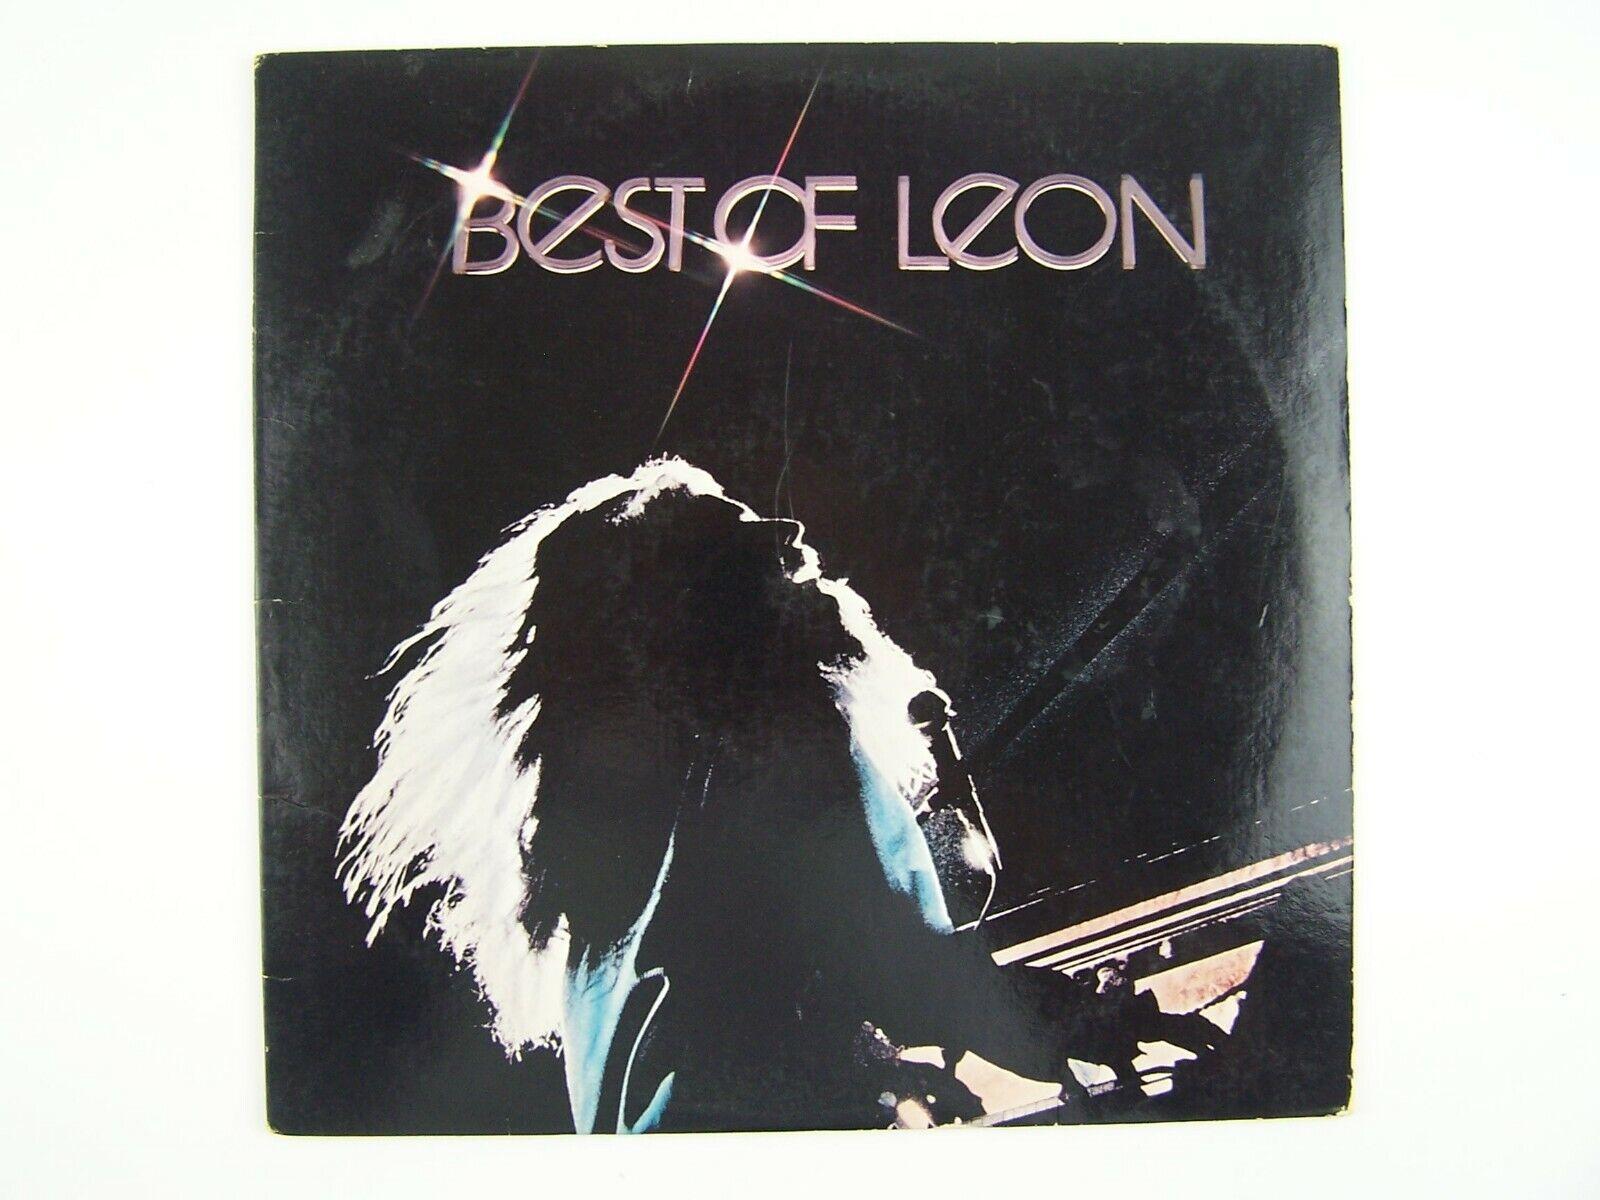 Leon Russell - Best Of Leon Vinyl LP Record Album SRL-5